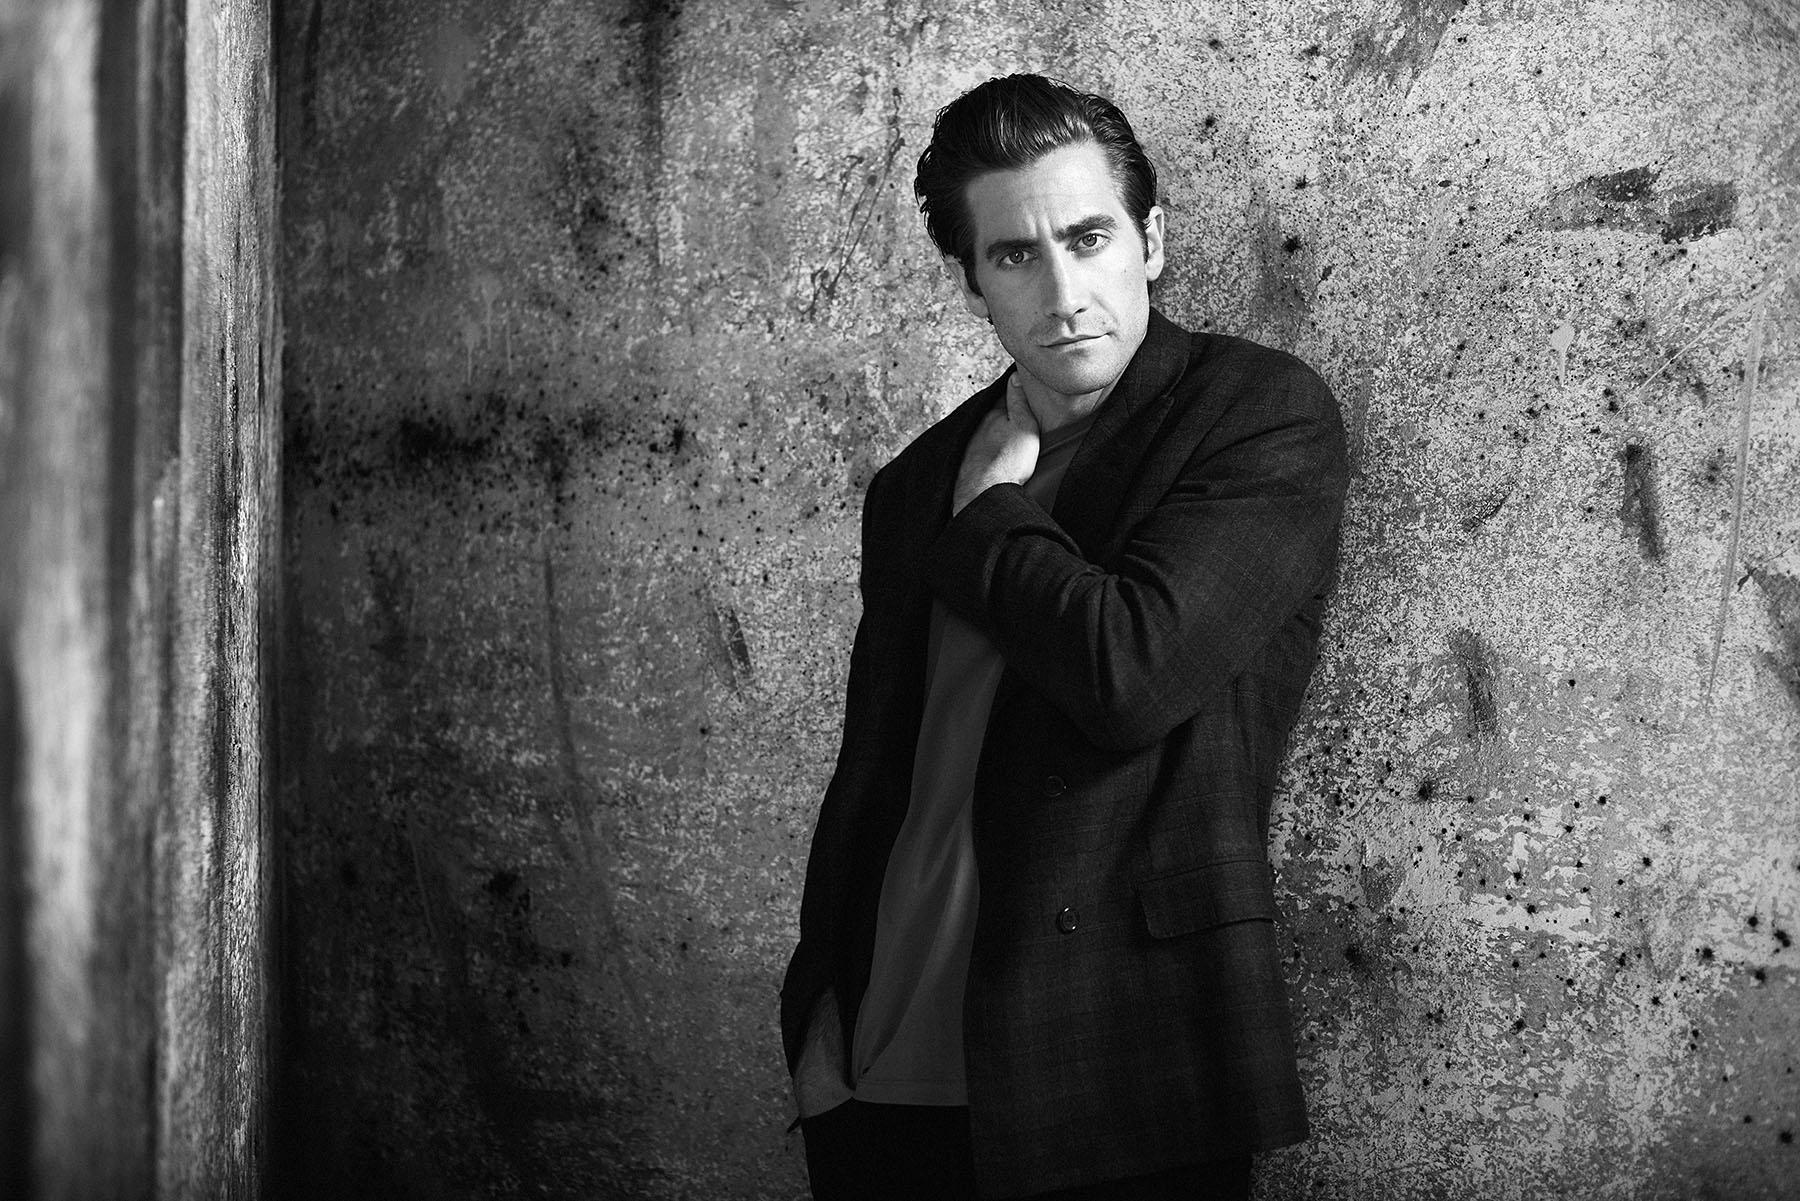 Jake Gyllenhaal_VES6983_final_BWWEB.jpg